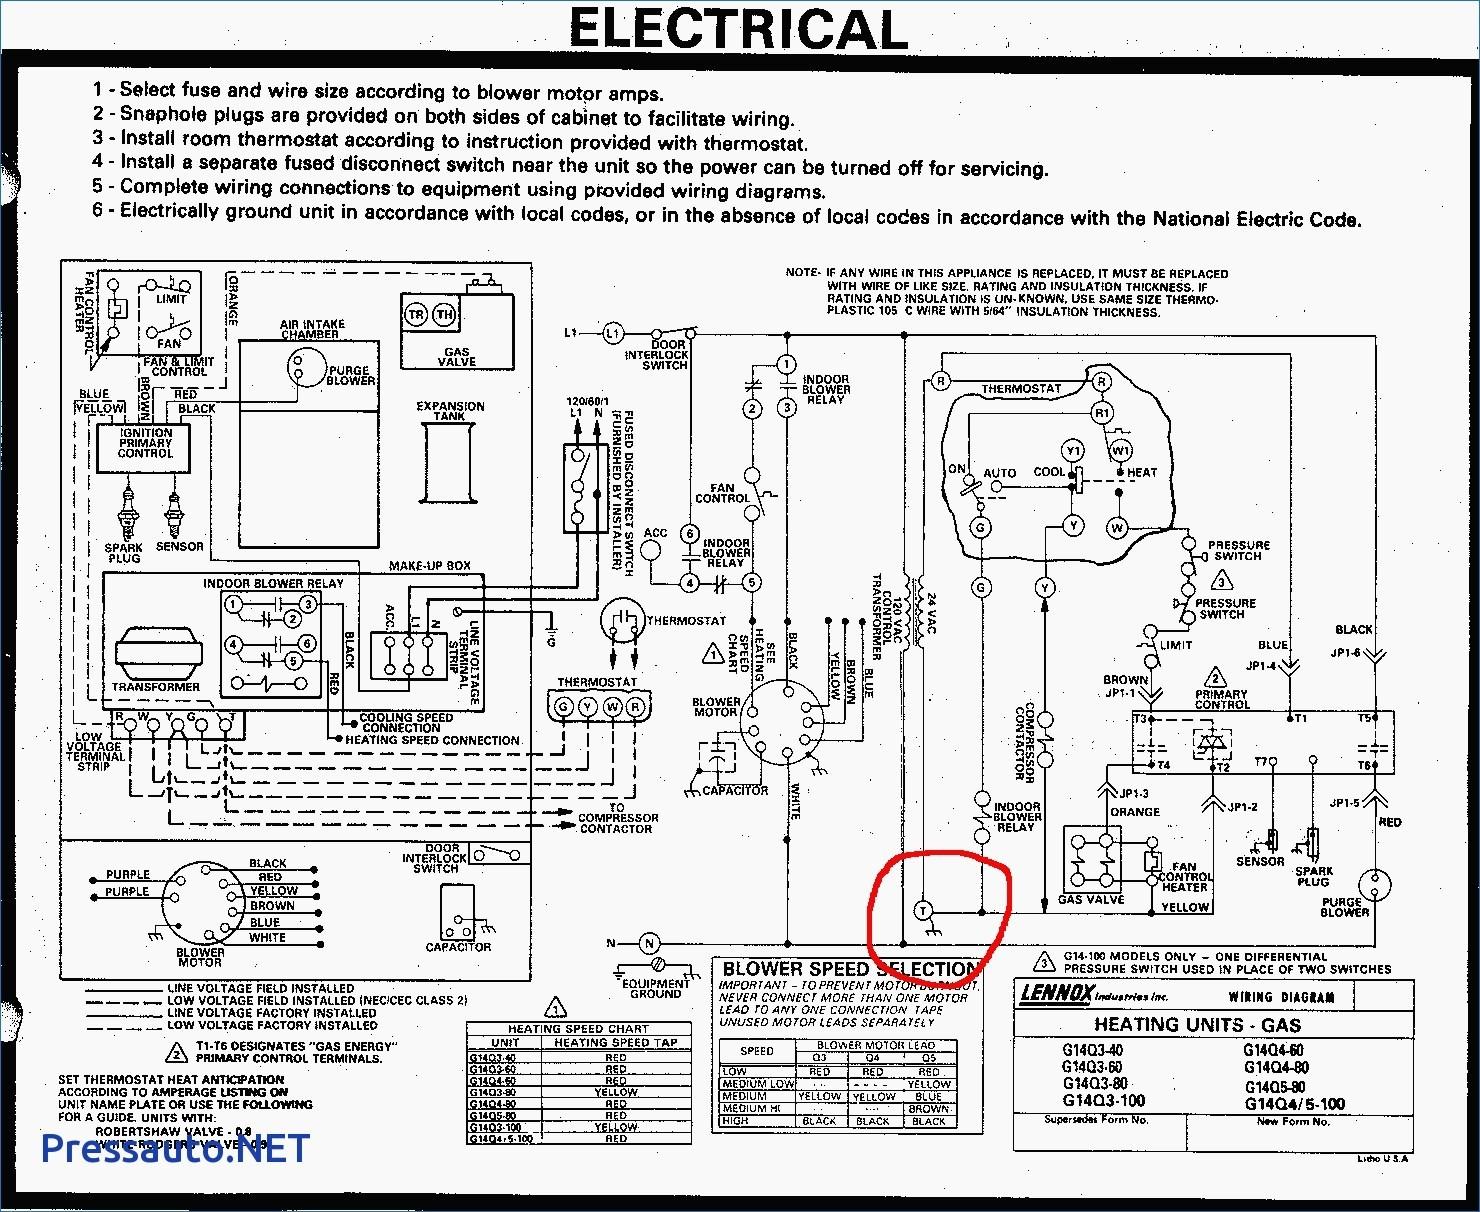 Rheem Gas Furnace Wiring Circuit Diagram Schema Hvac Diagrams Heat Pump Thermostat Image